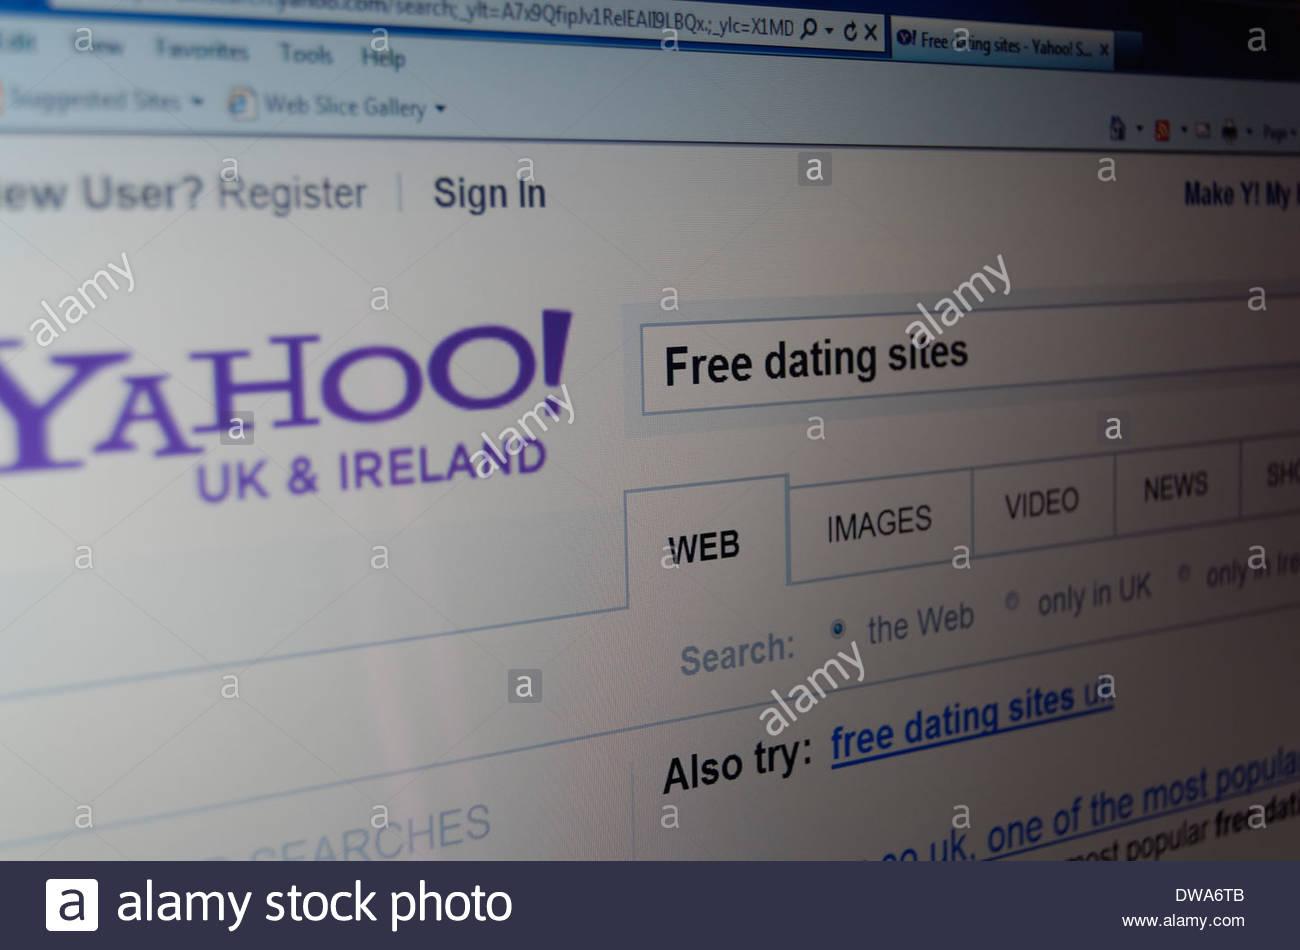 dating.com uk site login site yahoo